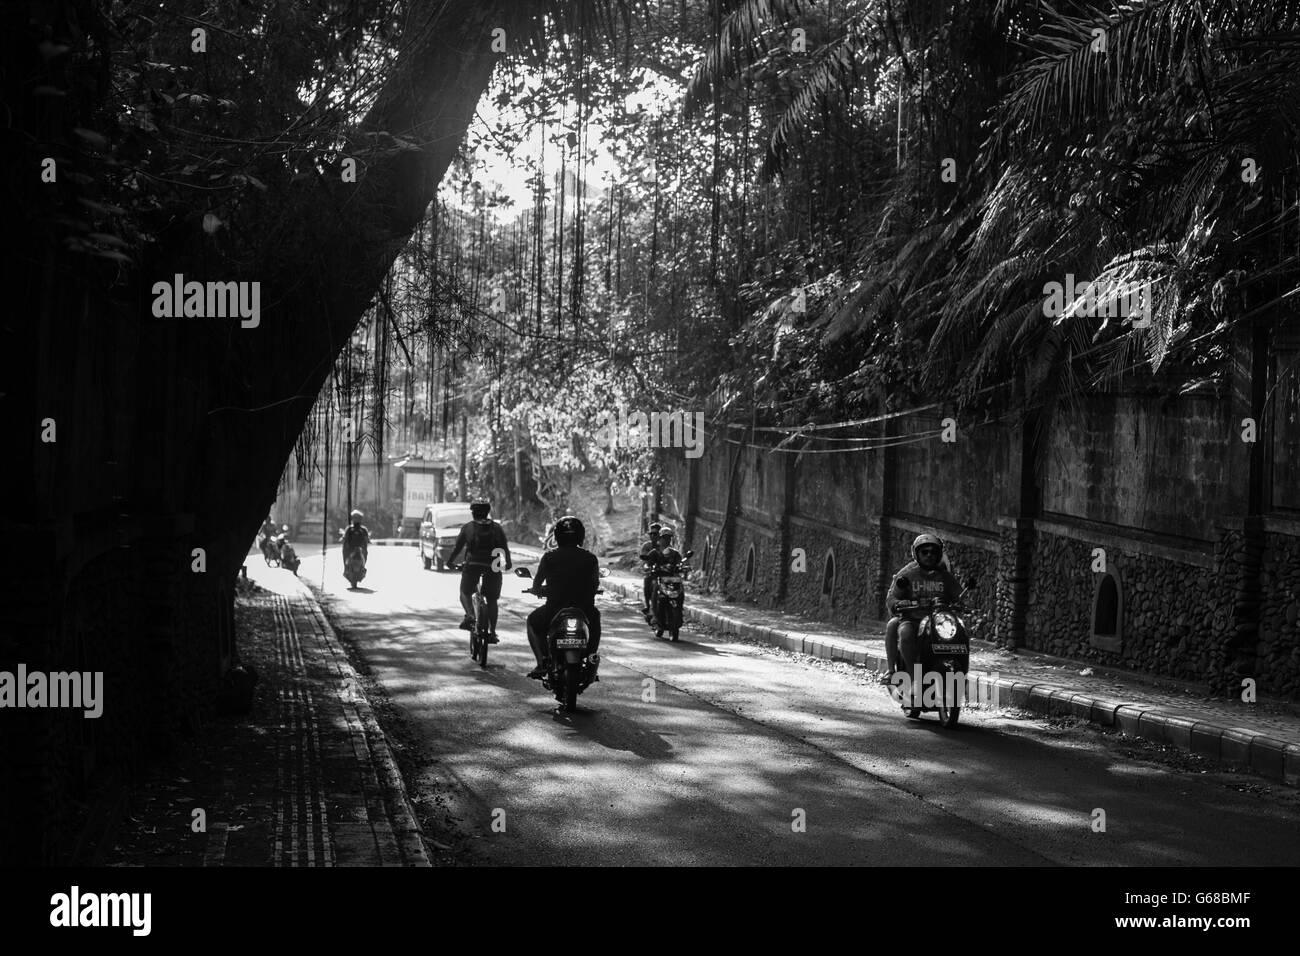 Ubud, Indonesia - September 5: A typical street scene in Ubud, Bali, Indonesia - Stock Image